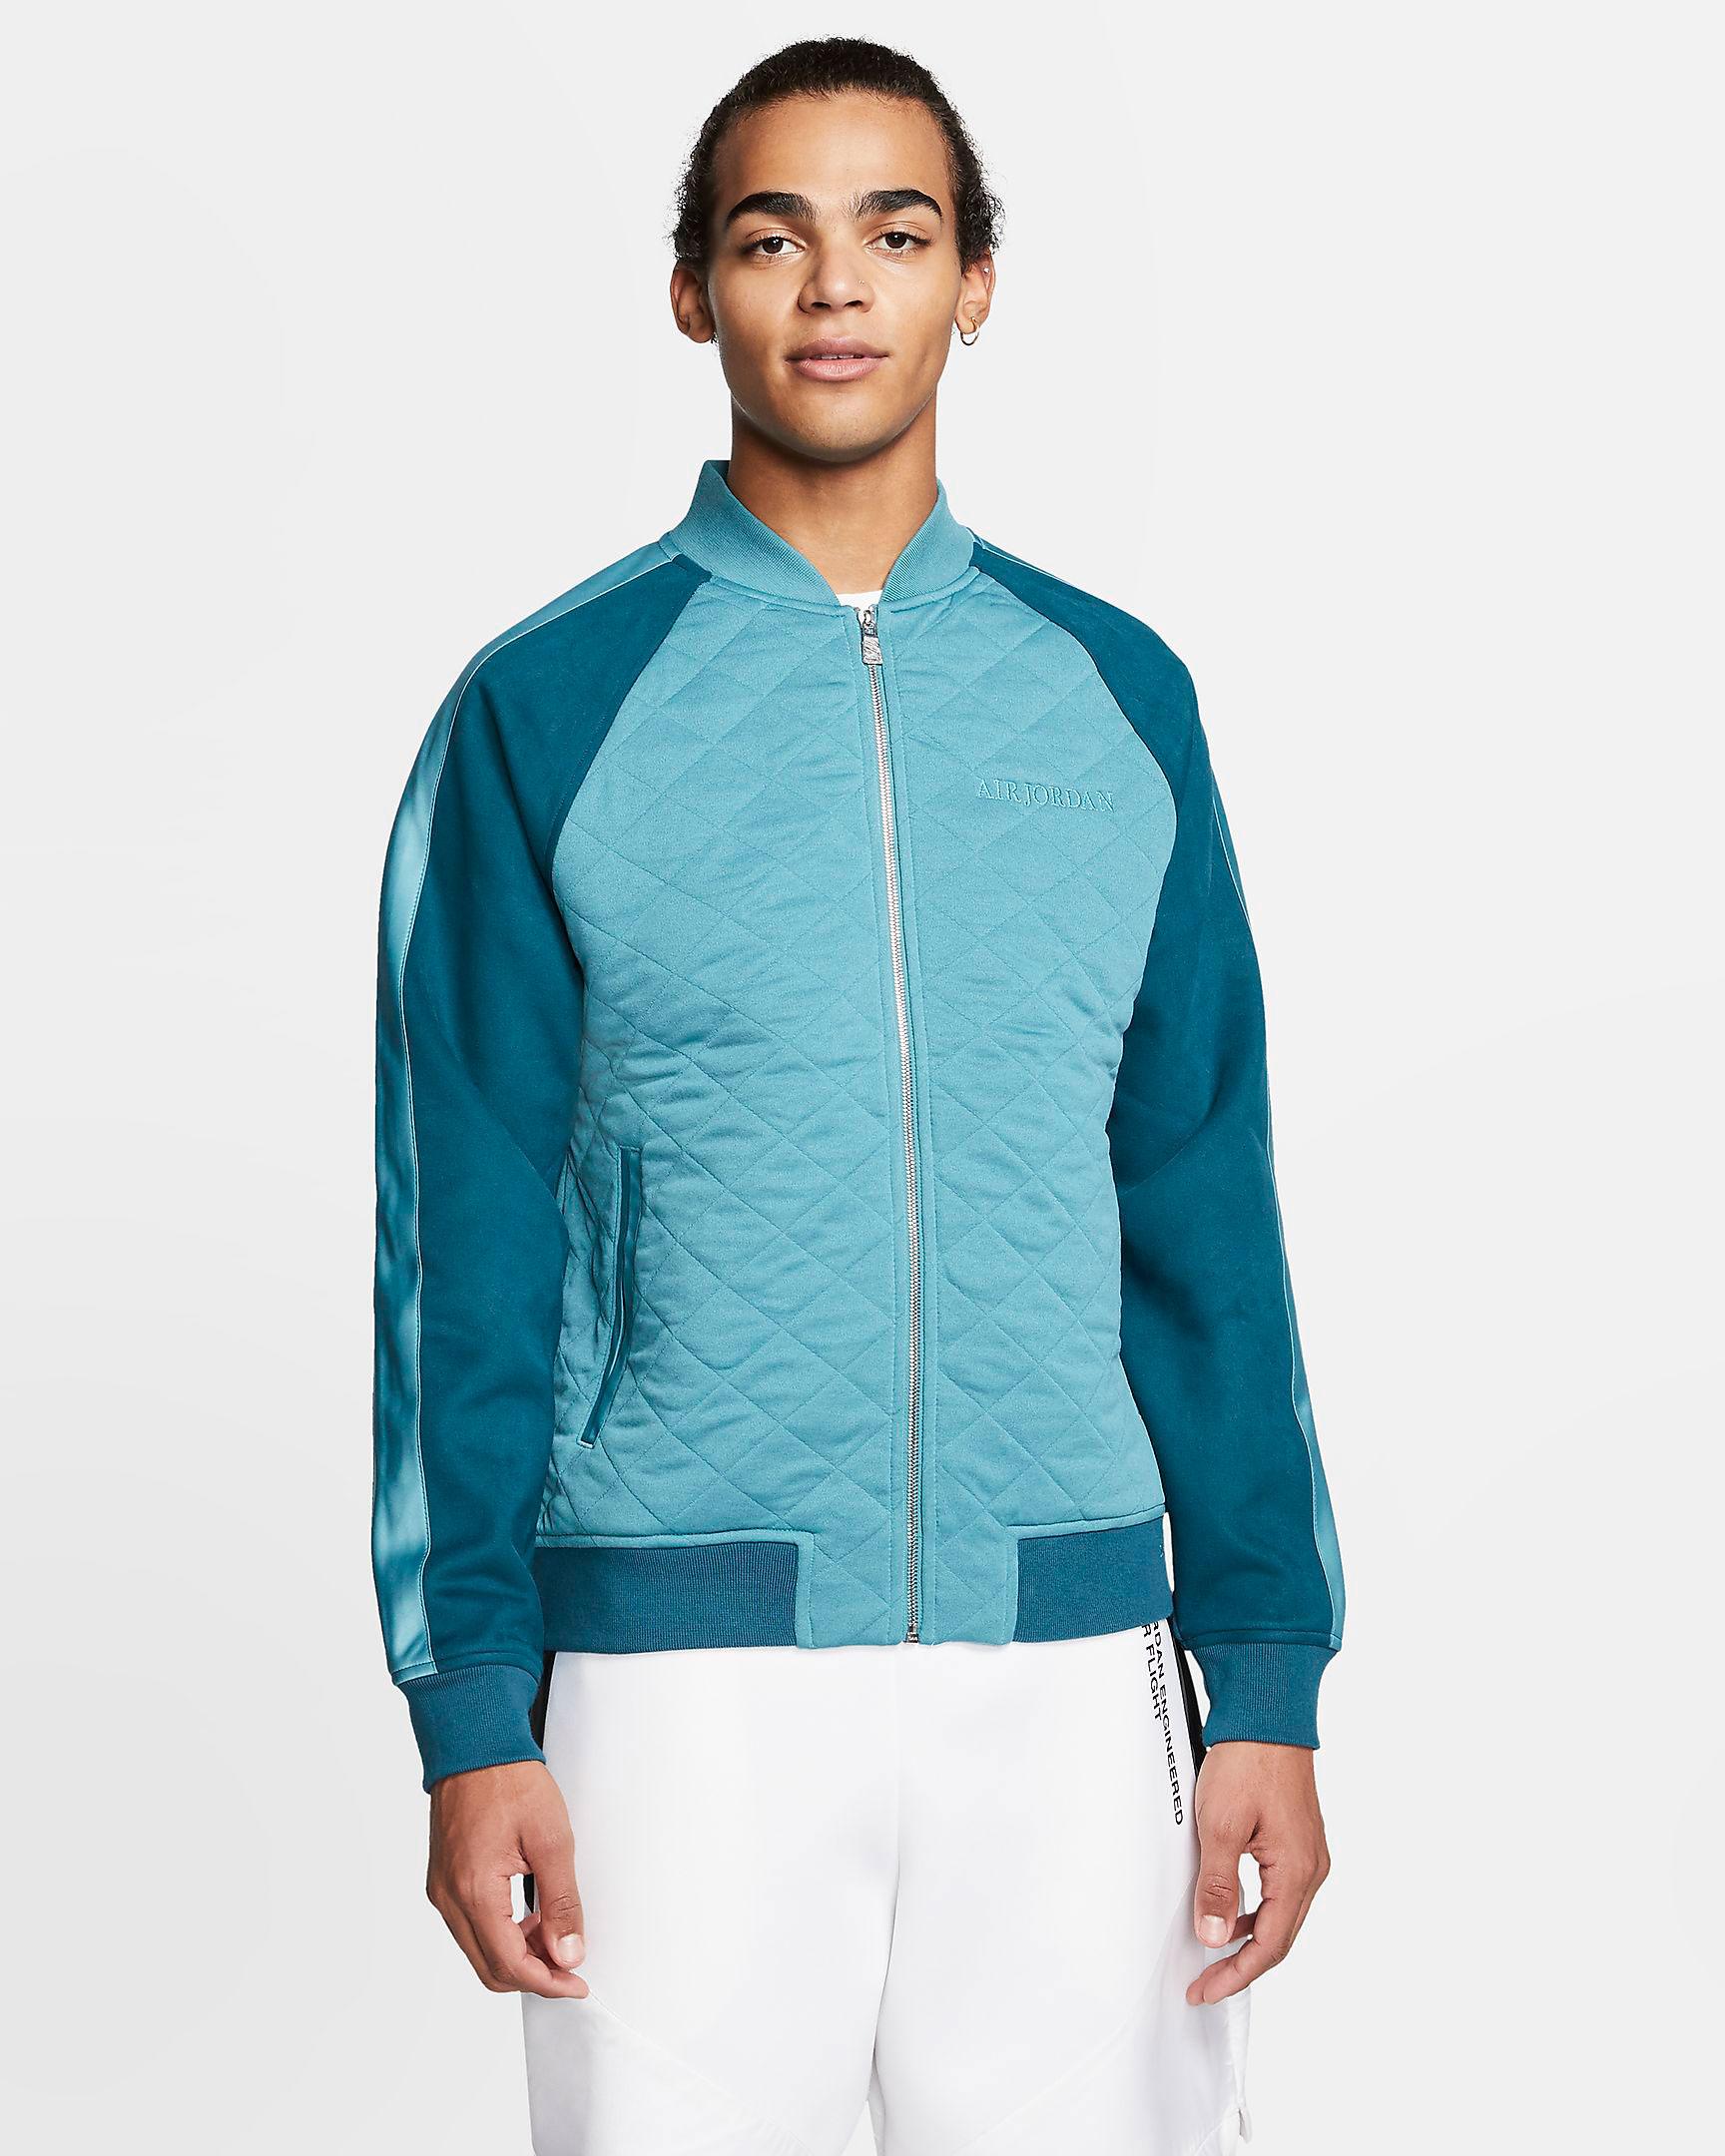 jordan-island-green-jacket-1